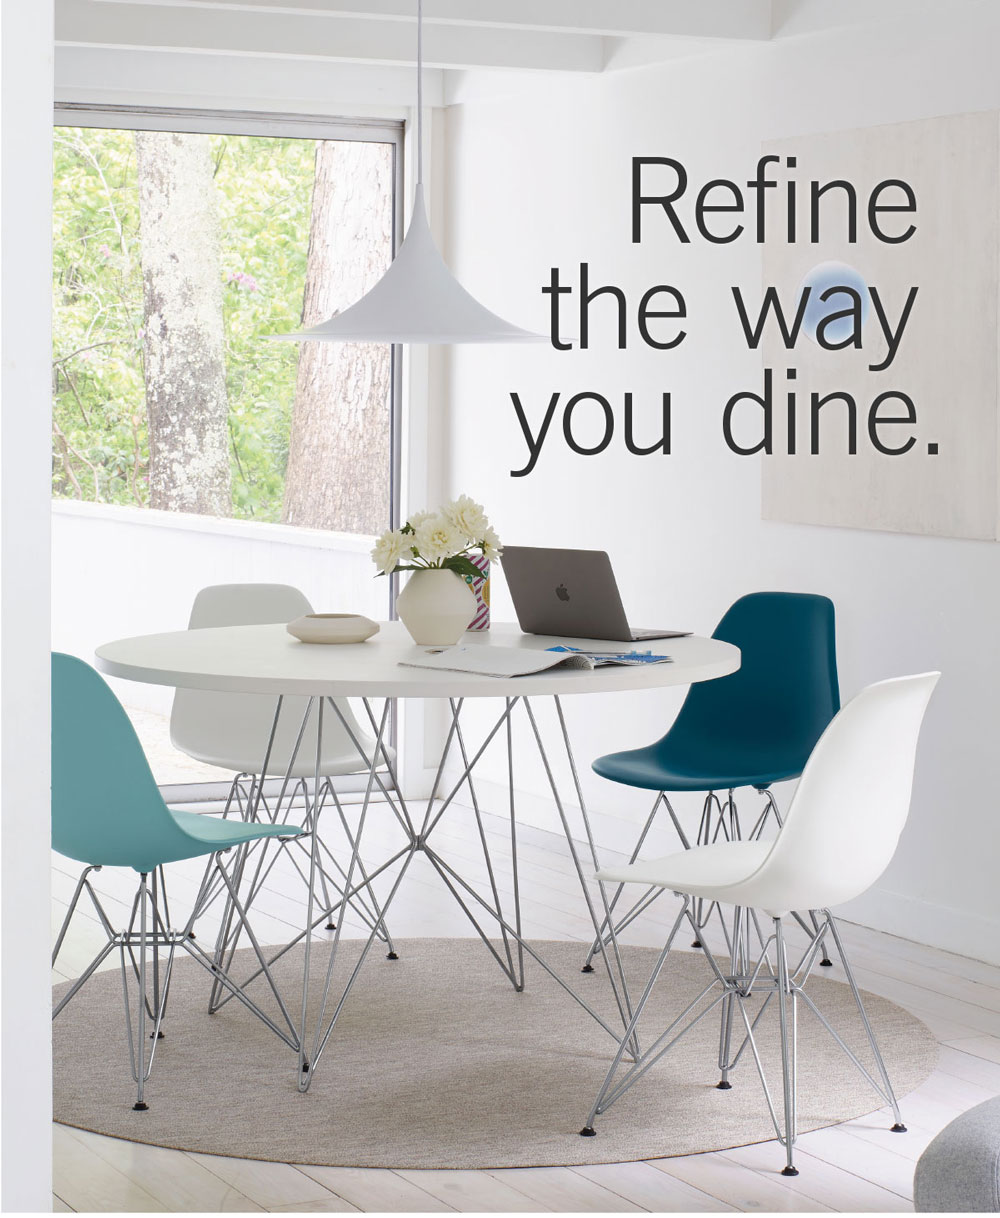 Refine the way you dine